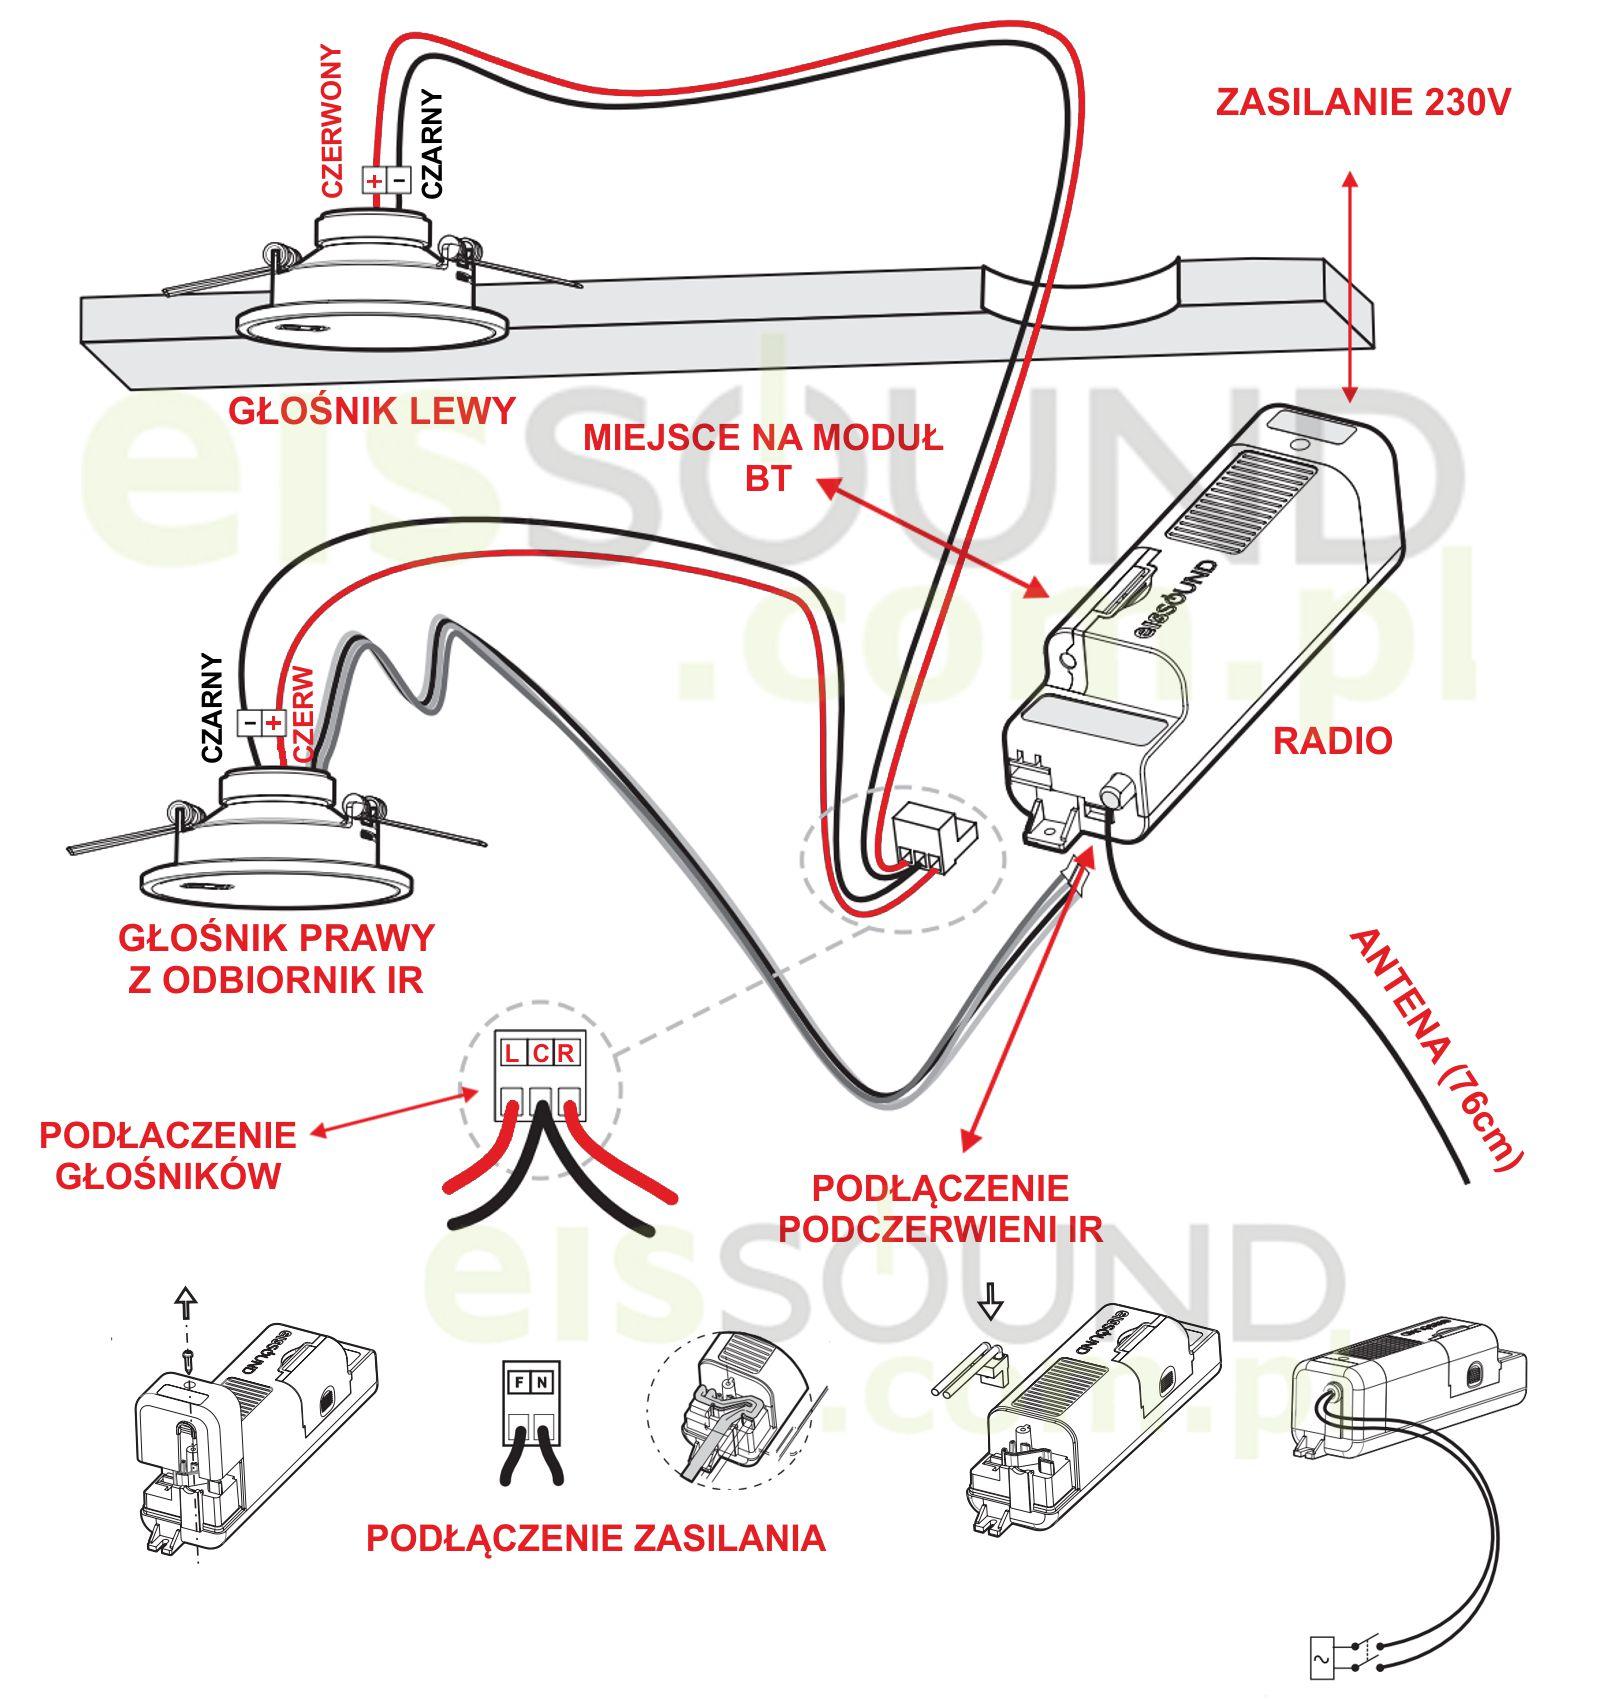 Iselect 5 50306+52593 schemat montazu radia do kuchni